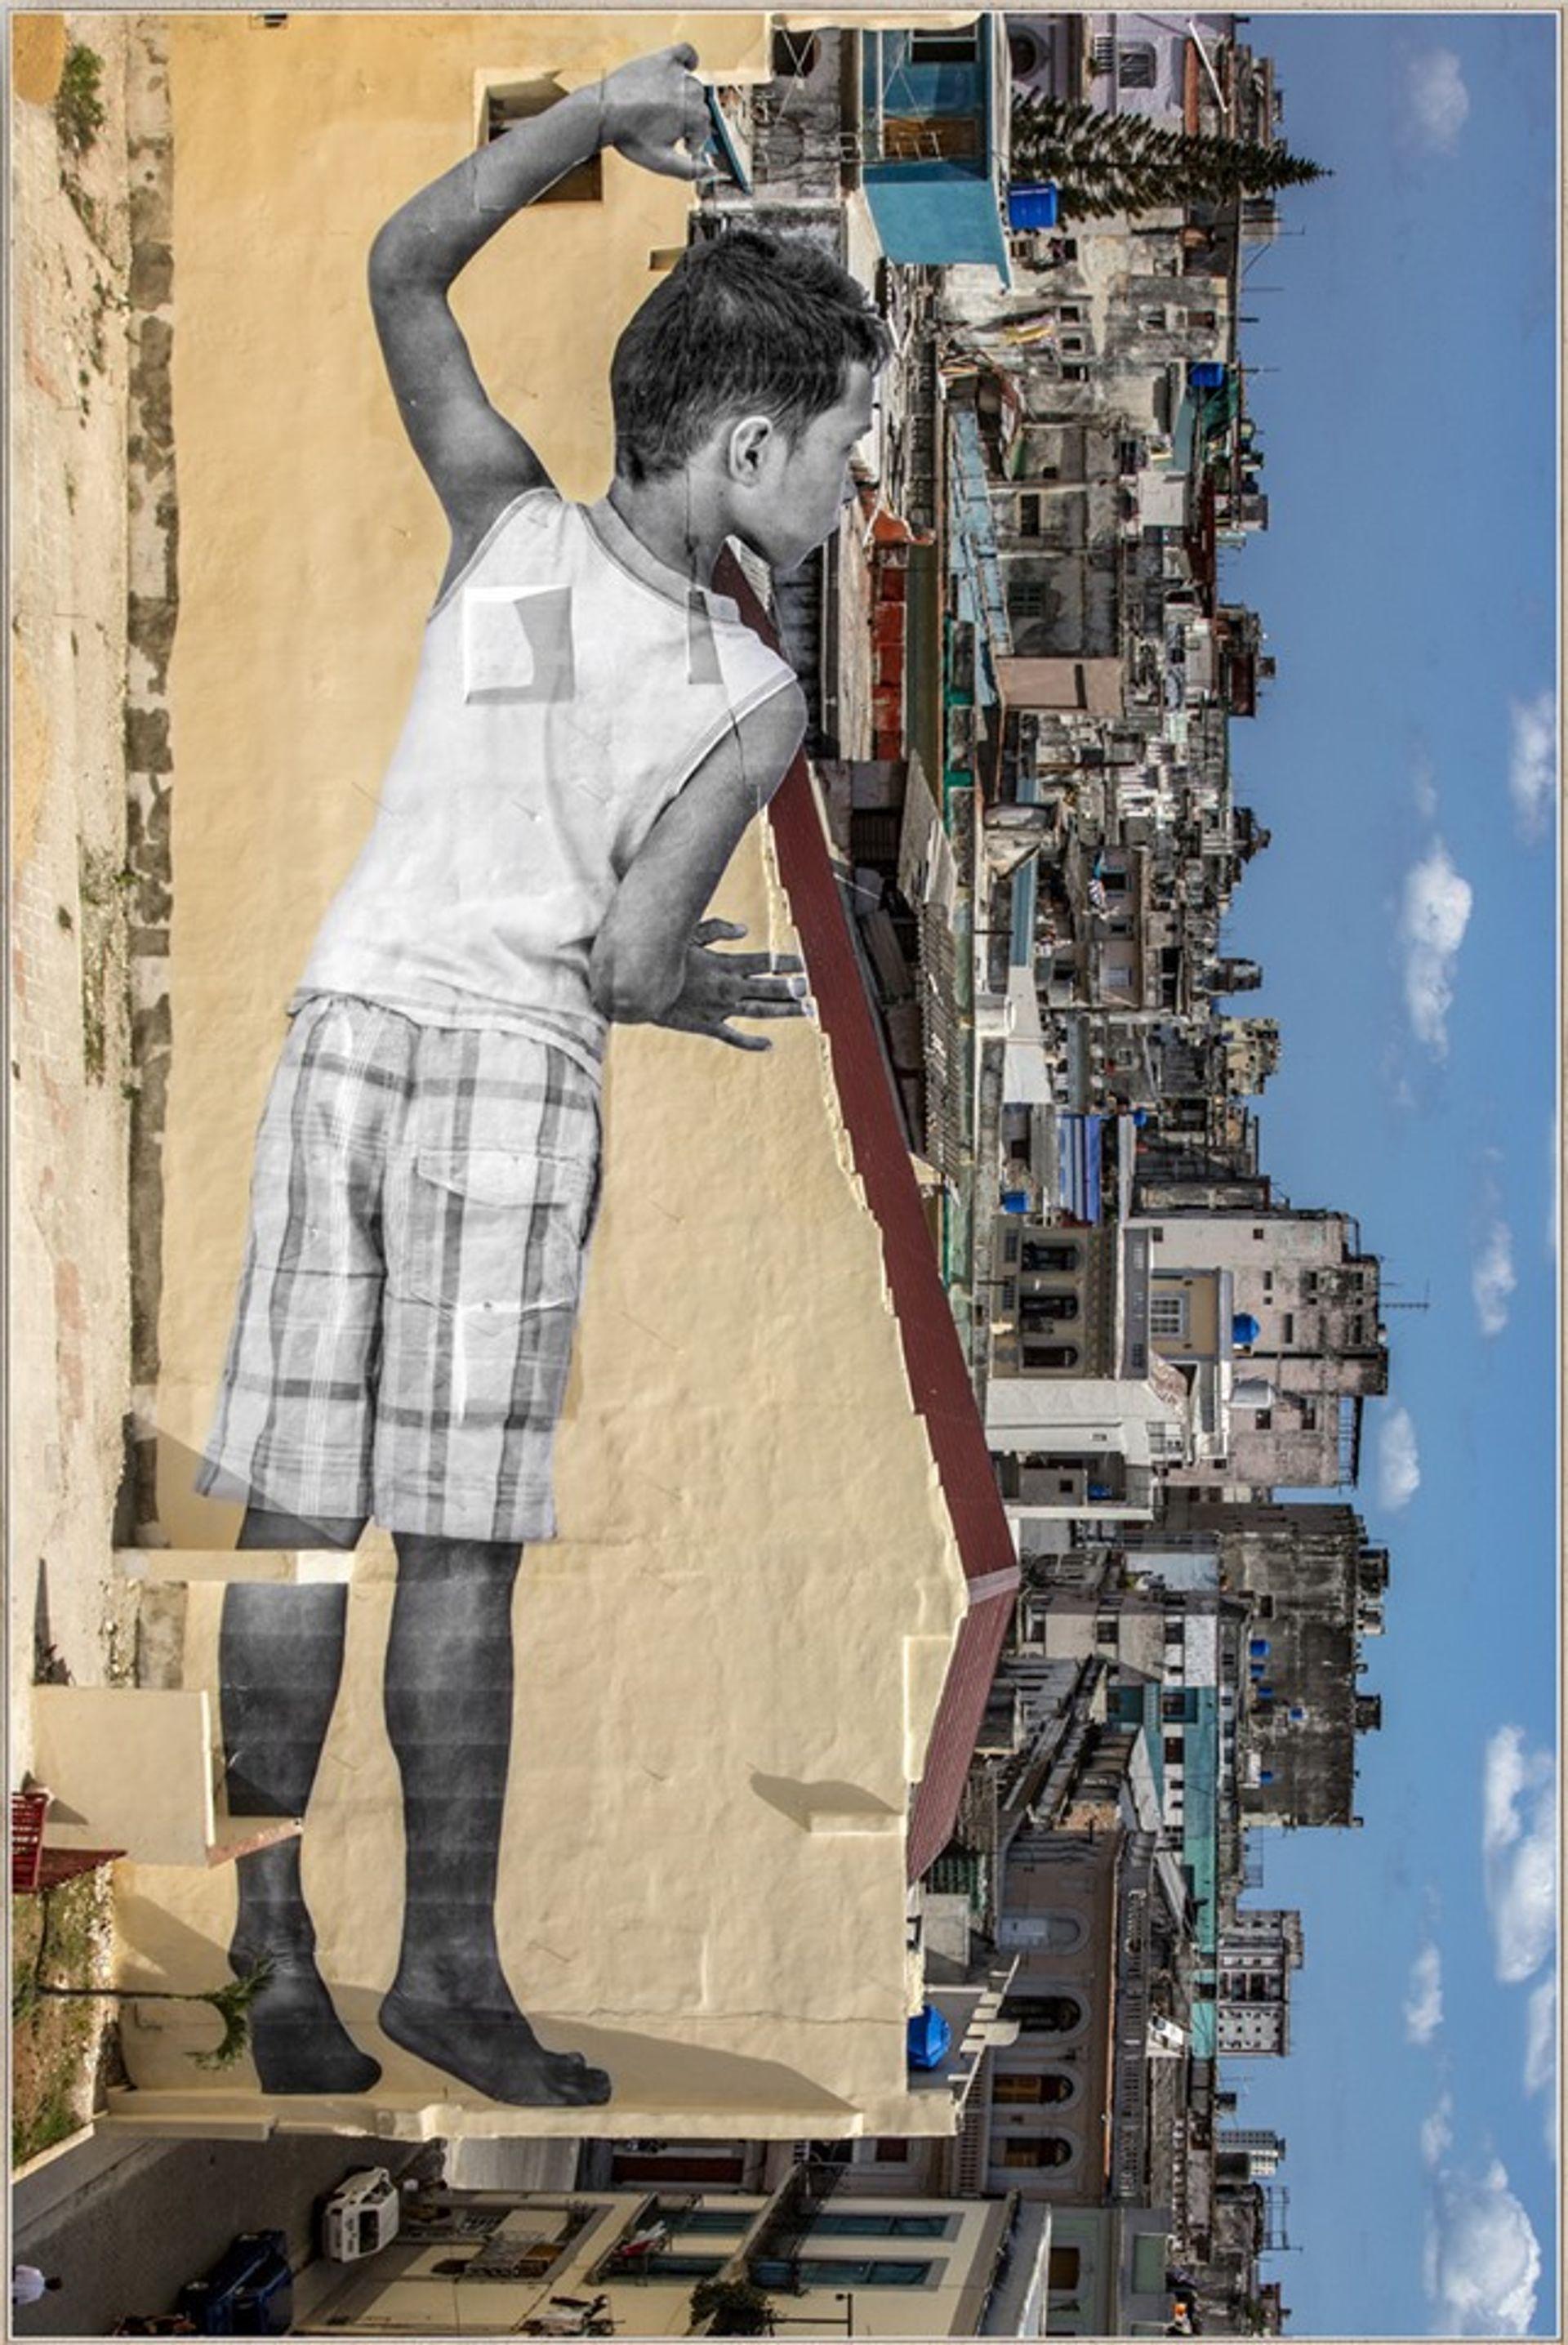 JR's GIANTS in Havana, Cuba (2019) Courtesy of Galleria Continua